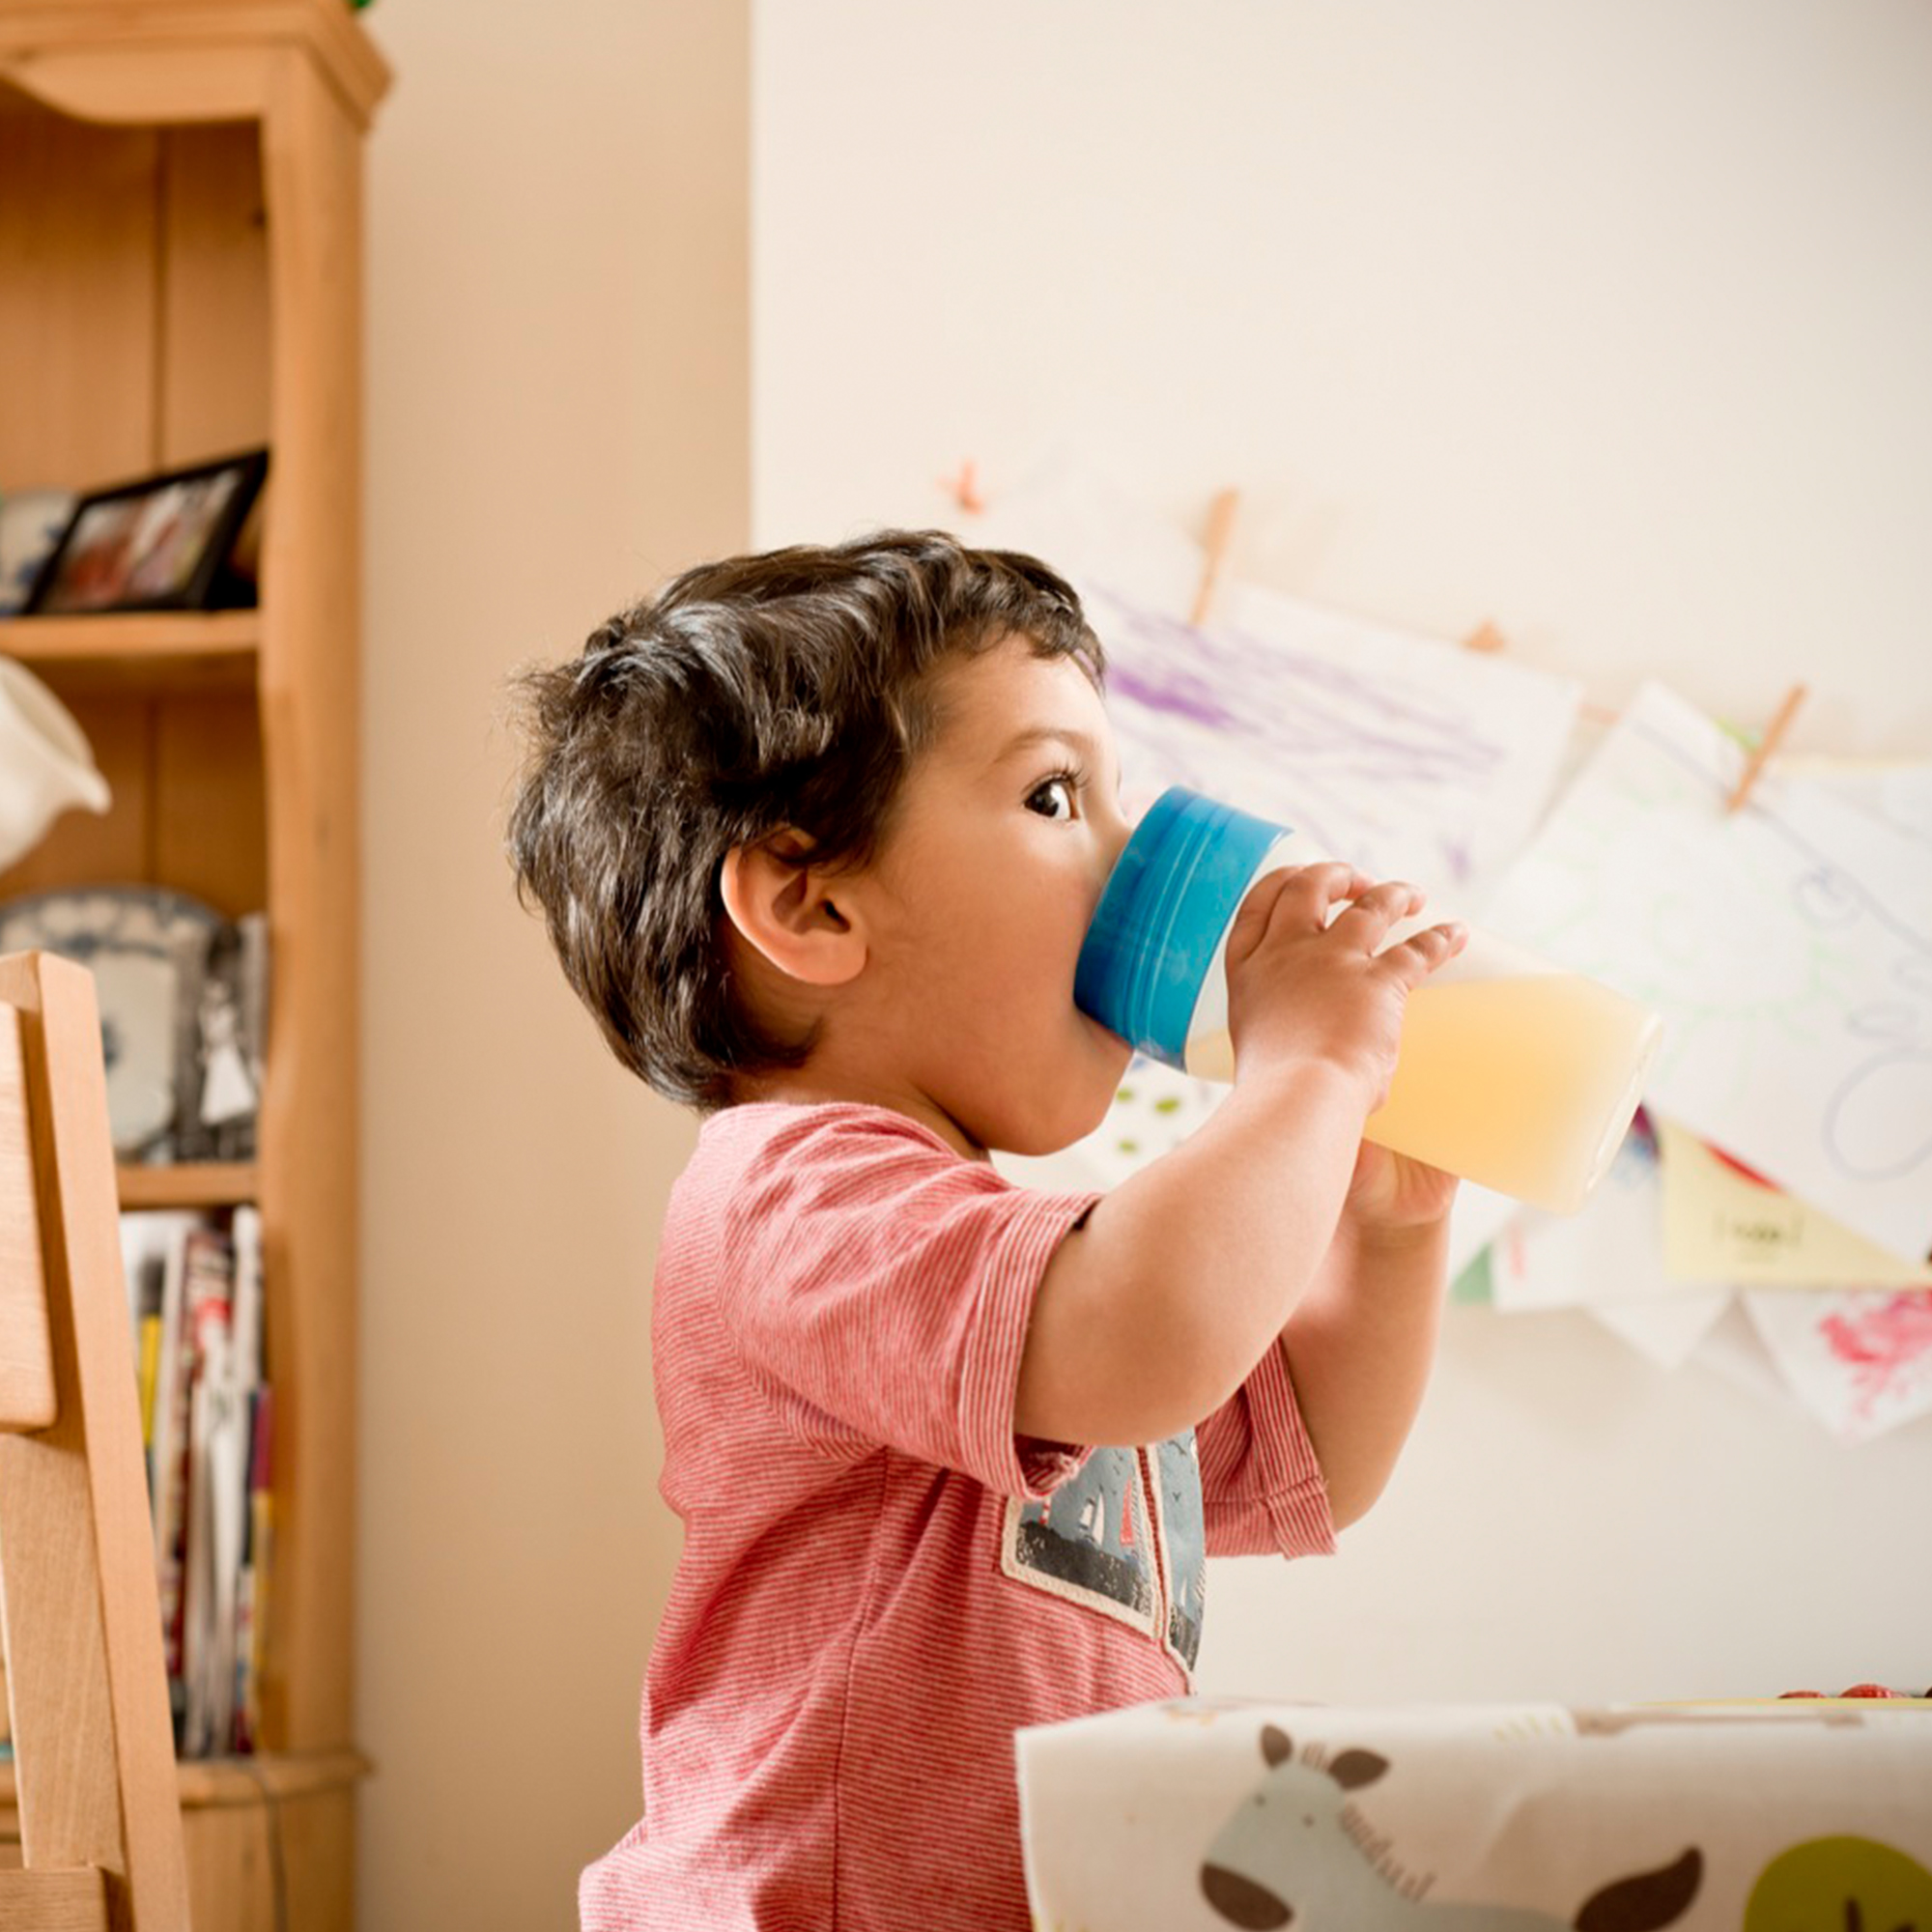 Little-Litecup-Sippy-Cup-Nightlight-Non-Spill-360-Drinking-Edge-220ml thumbnail 4